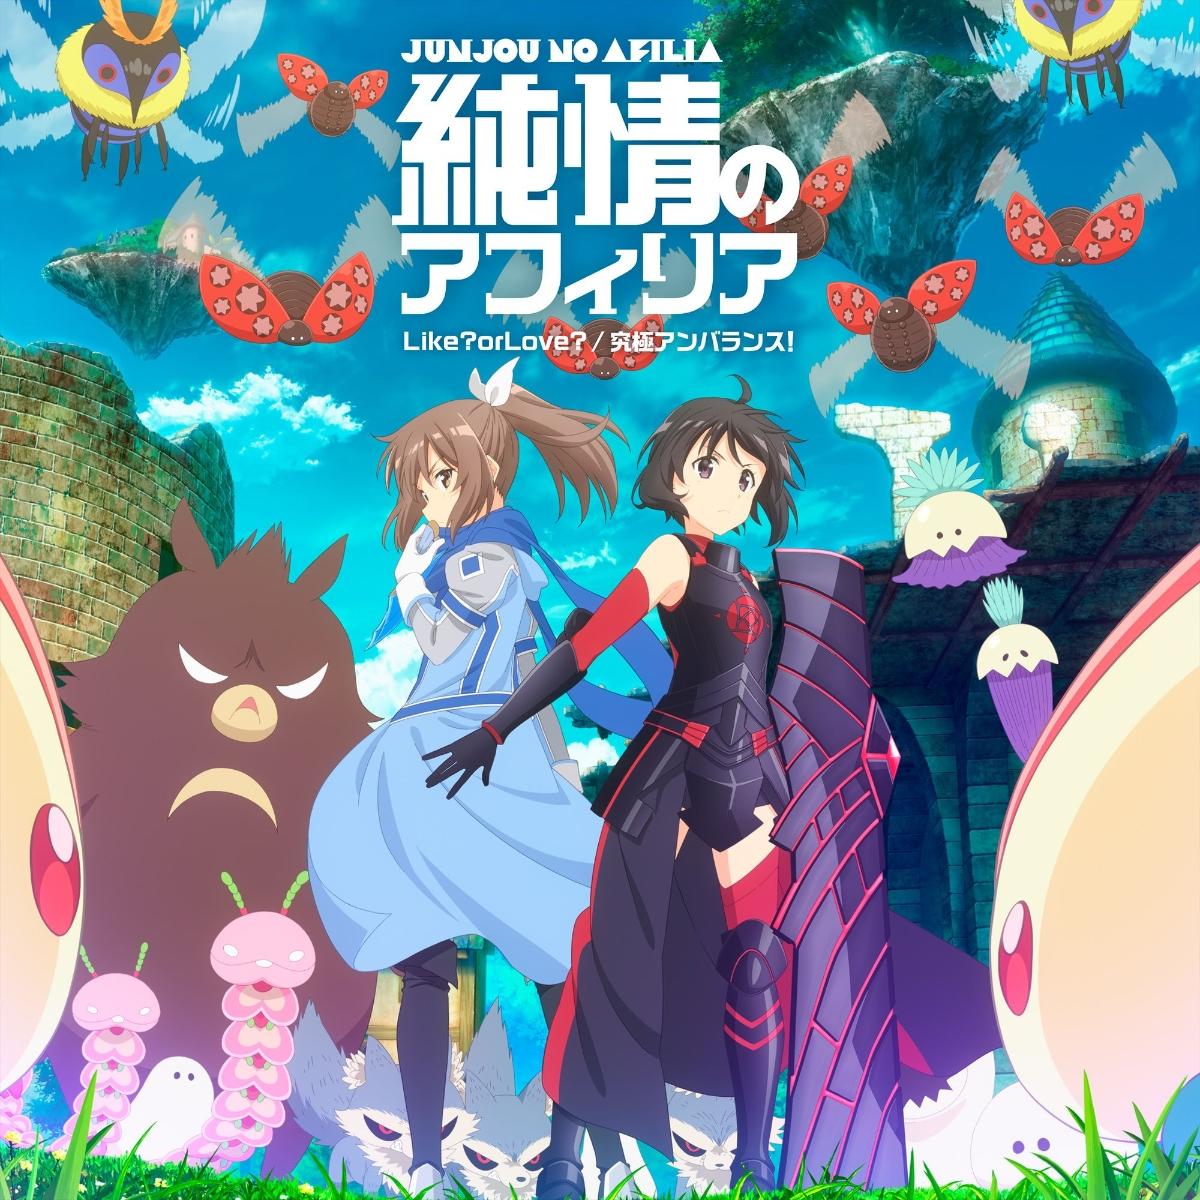 Junjou no Afilia - Like? or Love?/Kyuukyoku Unbalance!    純情のアフィリア / Like? or Love?/究極アンバランス!